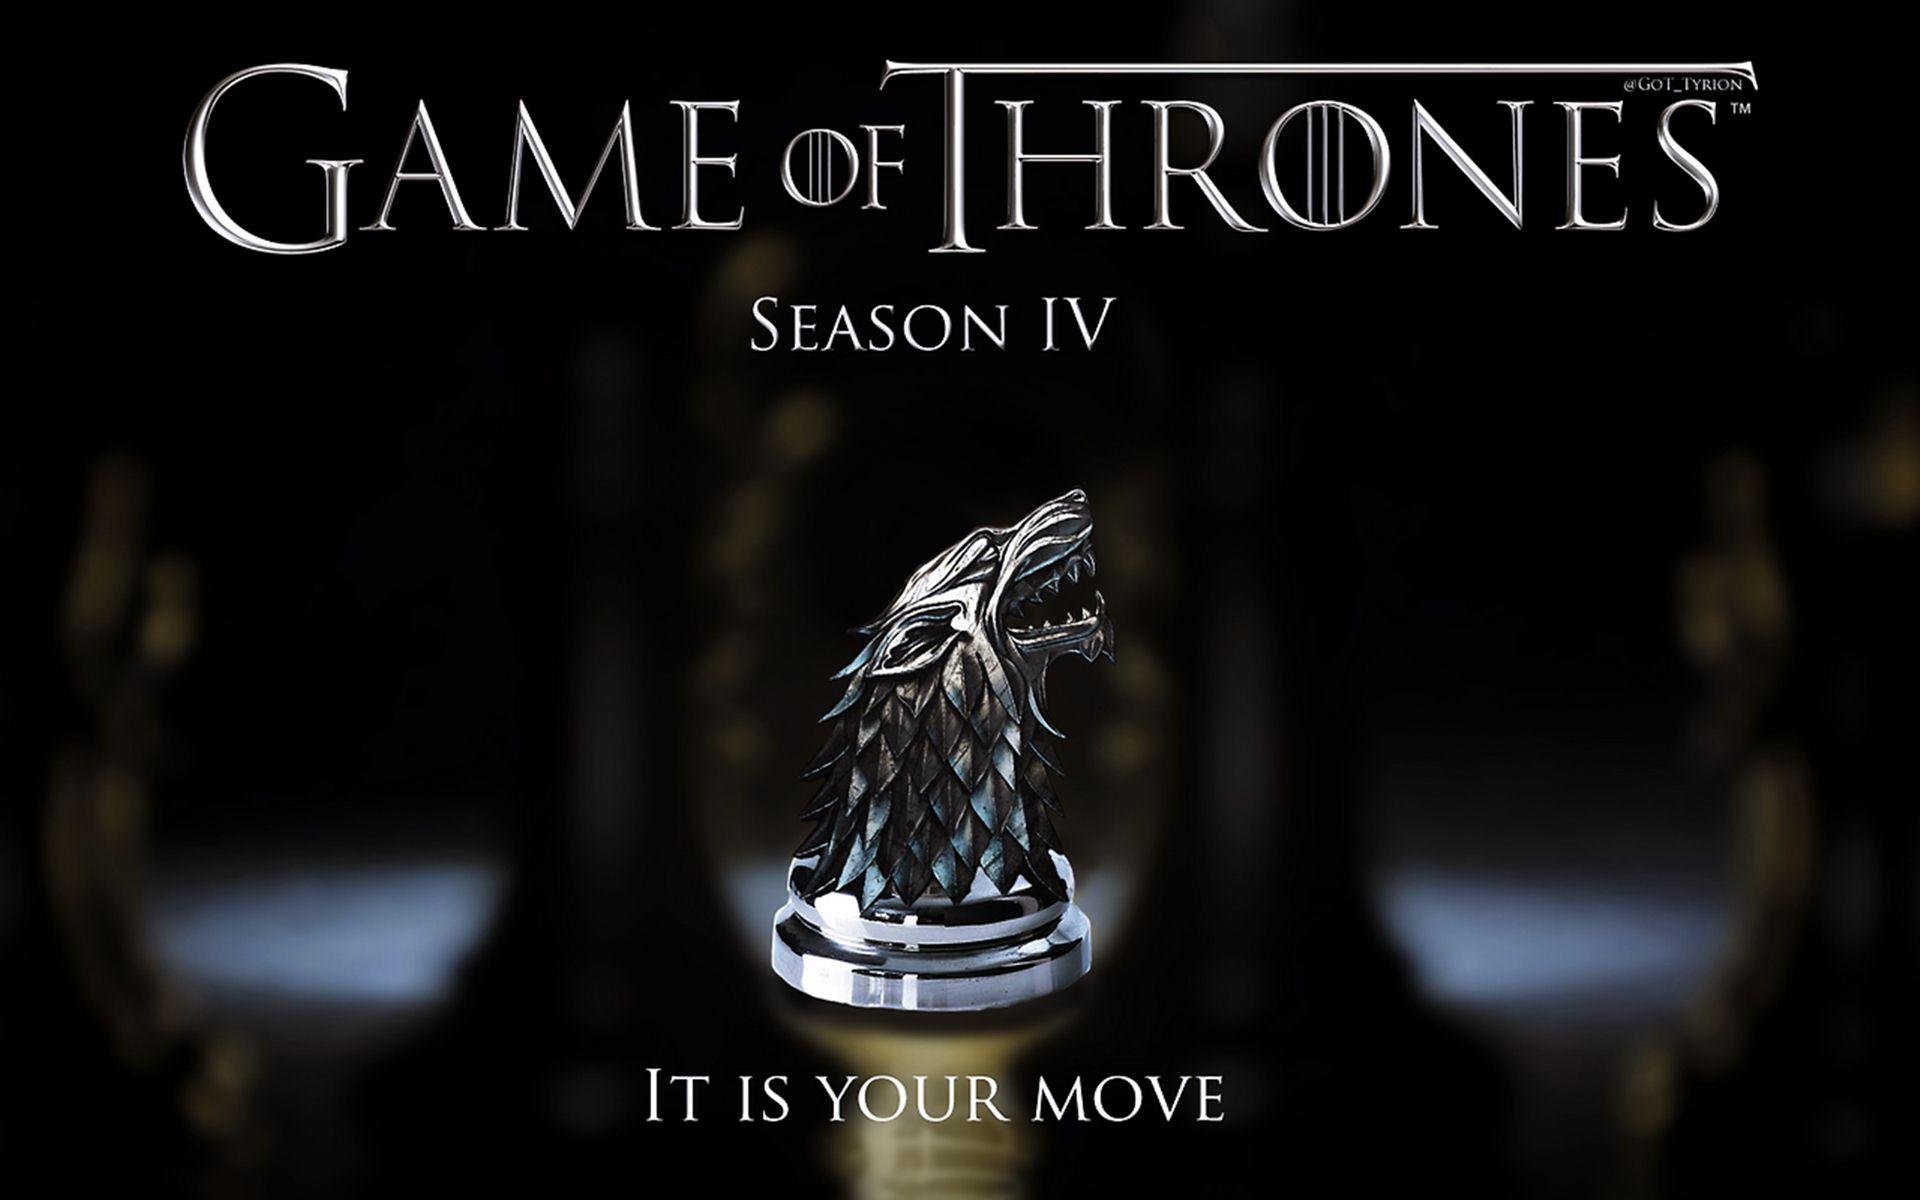 Download Subs Game Of Thrones Season 4 Subtitle English Srt 2019 Subtitle Seeker